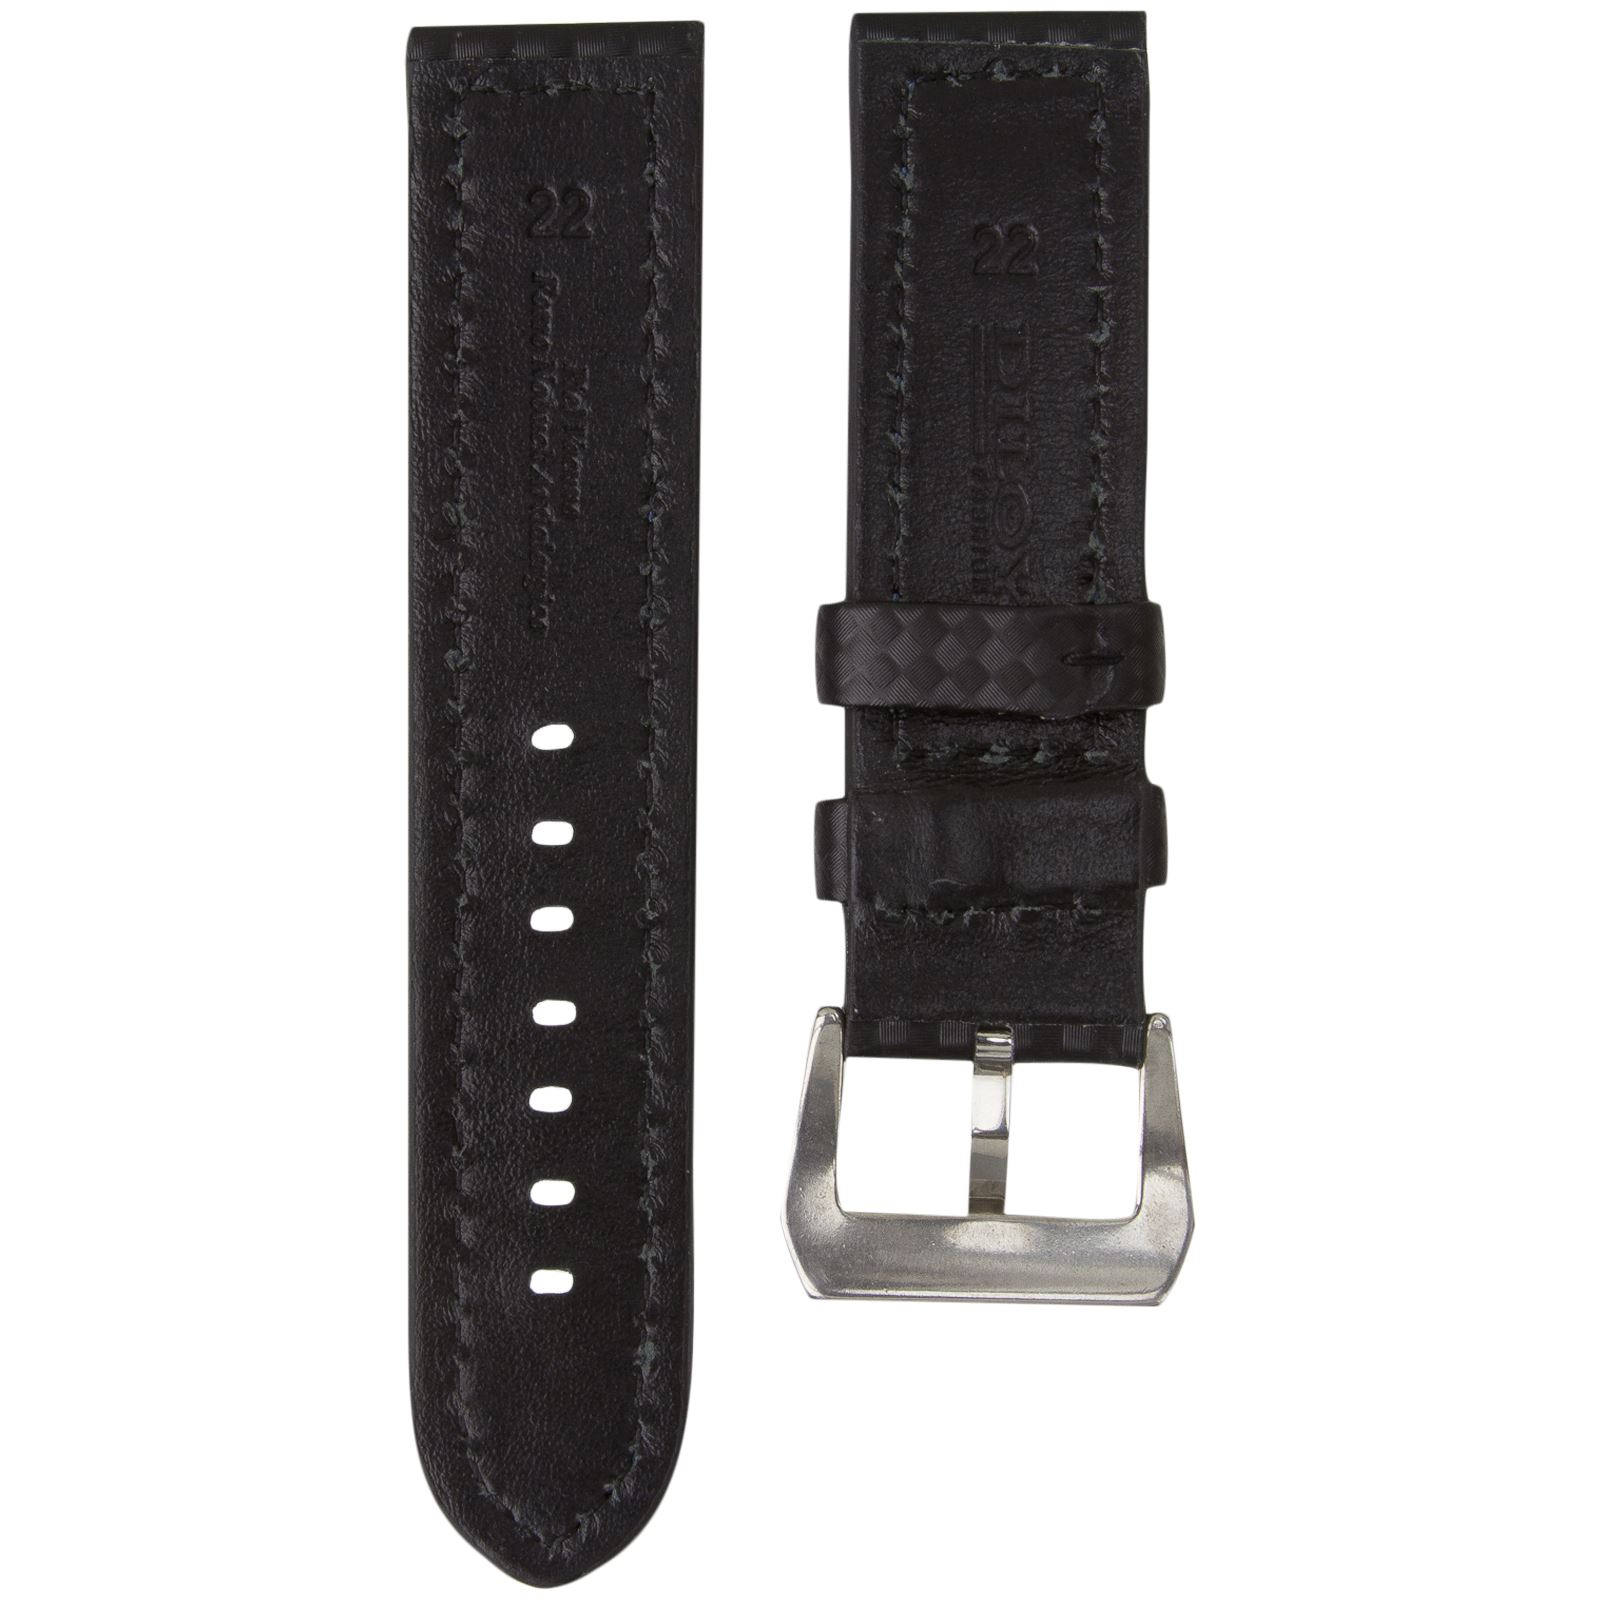 Diloy Genuine Leather Watch Strap Carbon Fibre 22 24mm